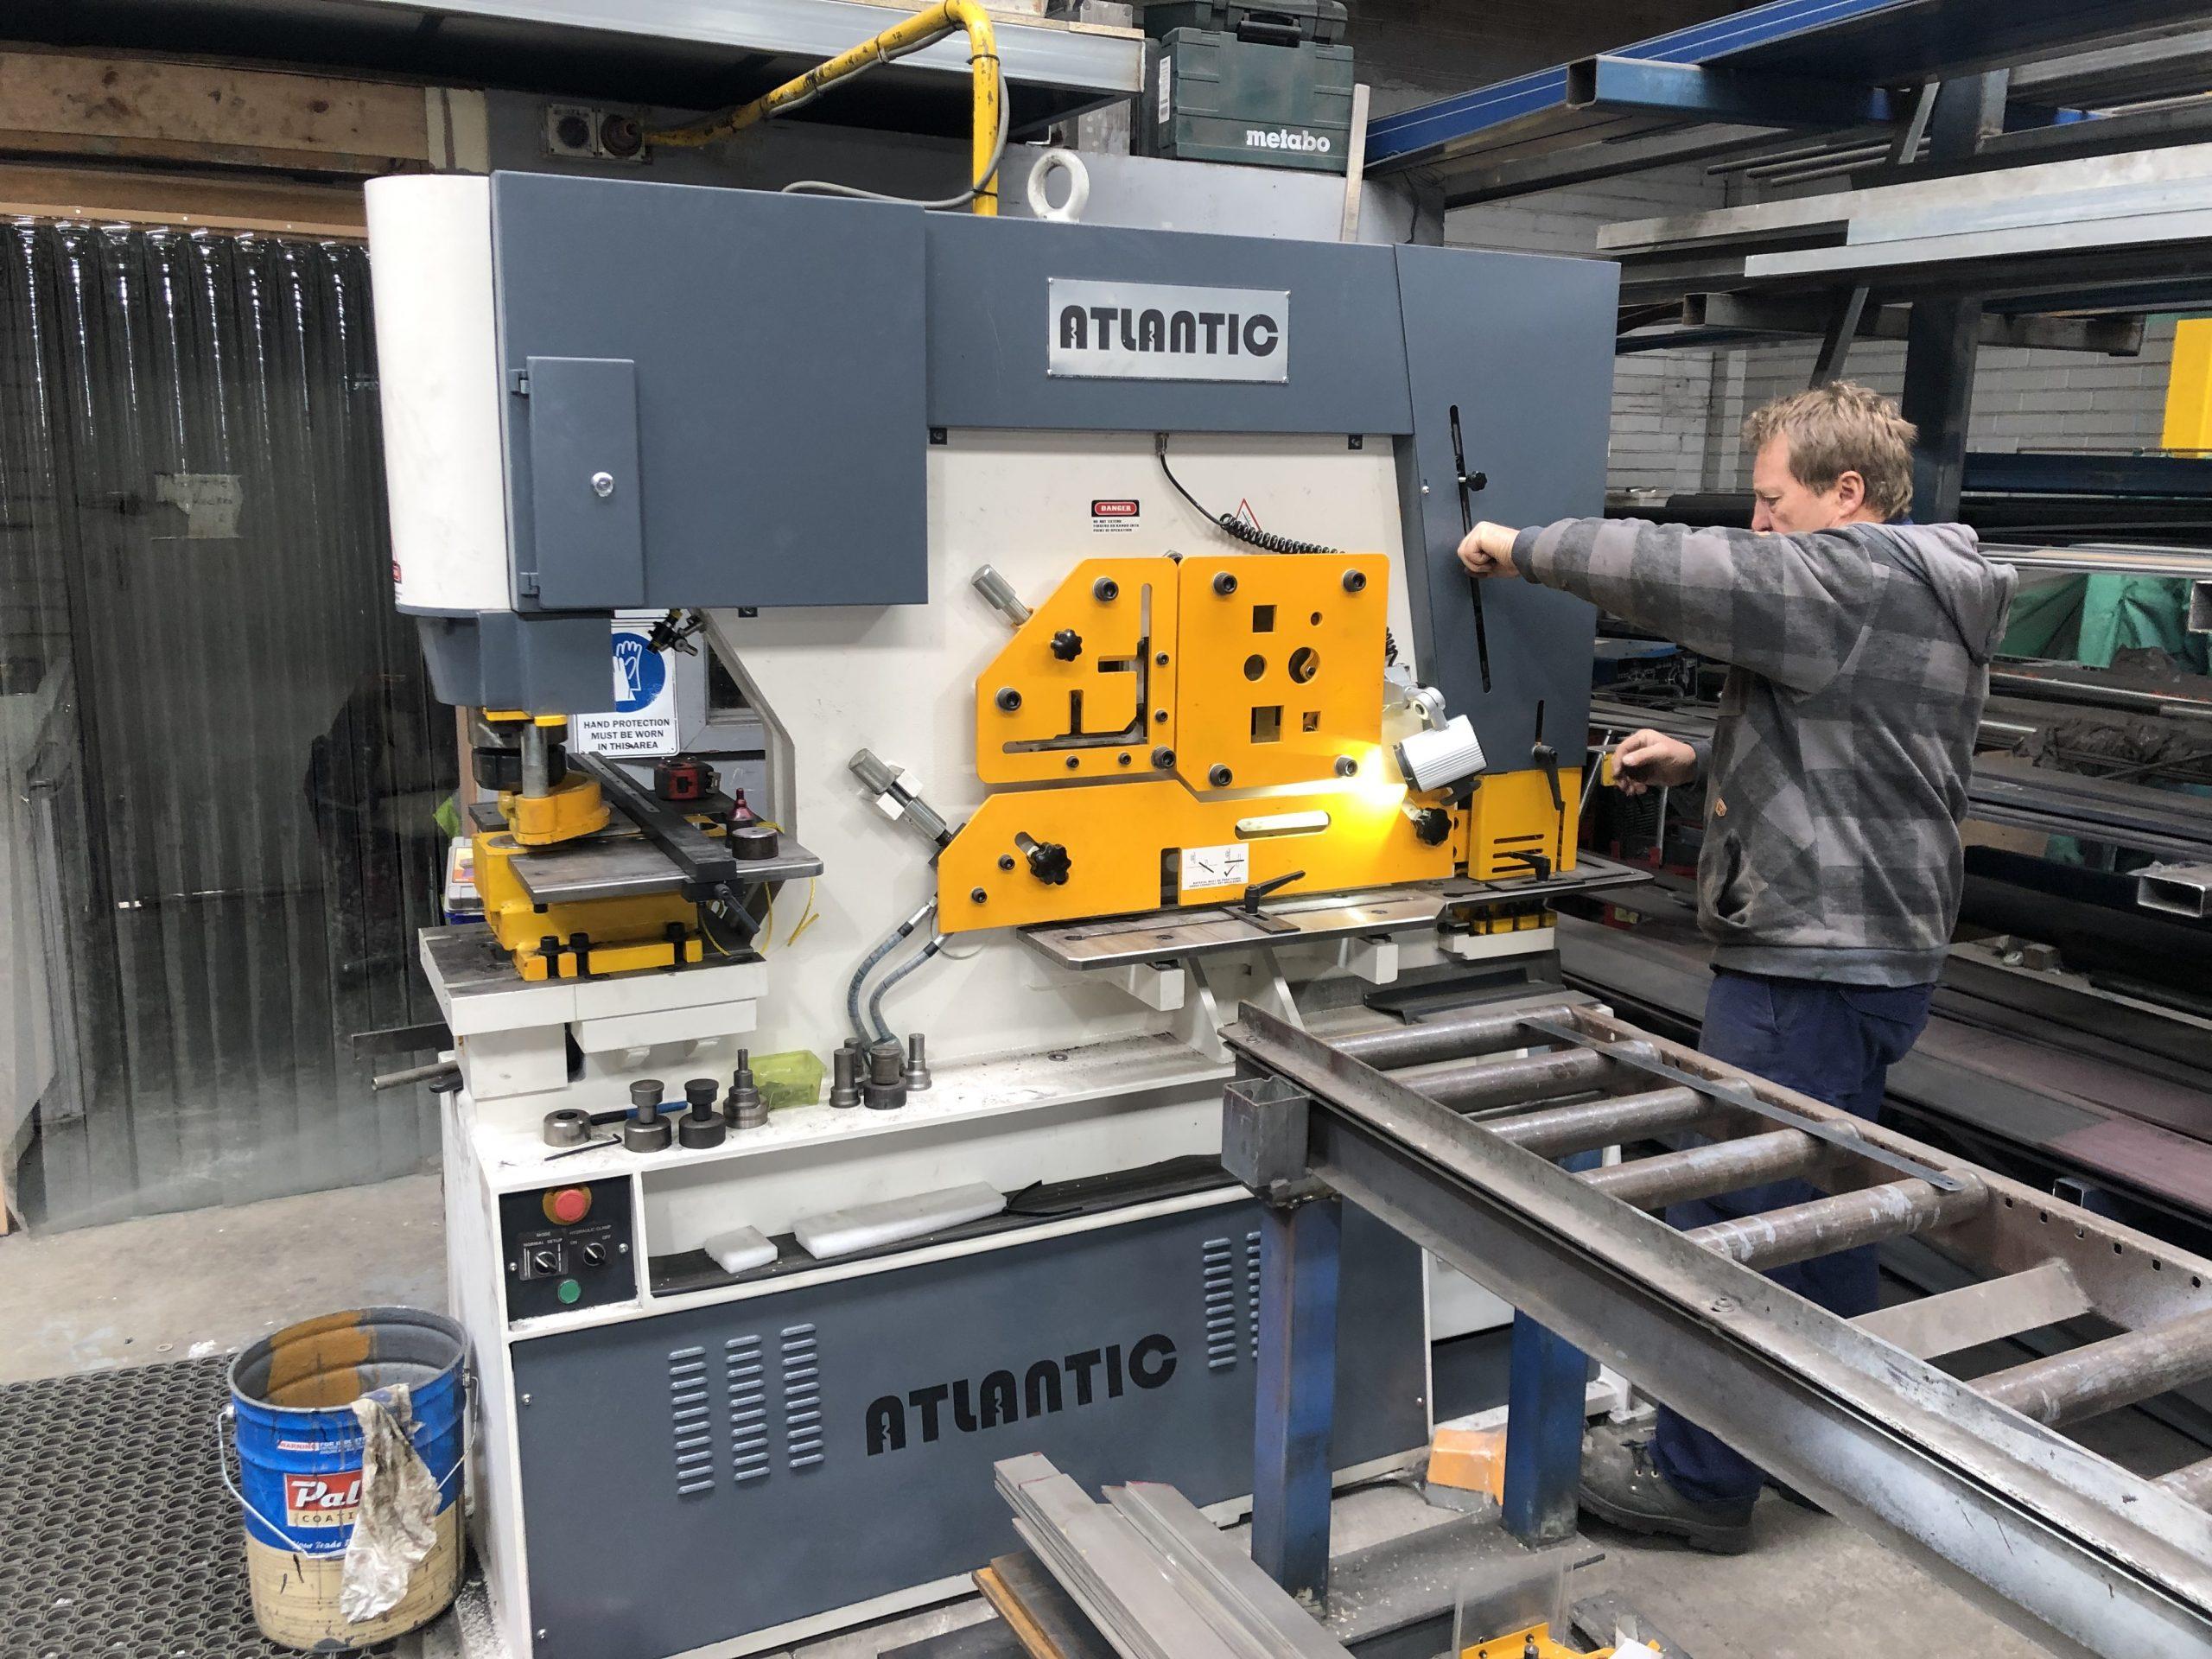 Kingsland Atlantic Multi 125 Iron Worker For Sale In Australia 2